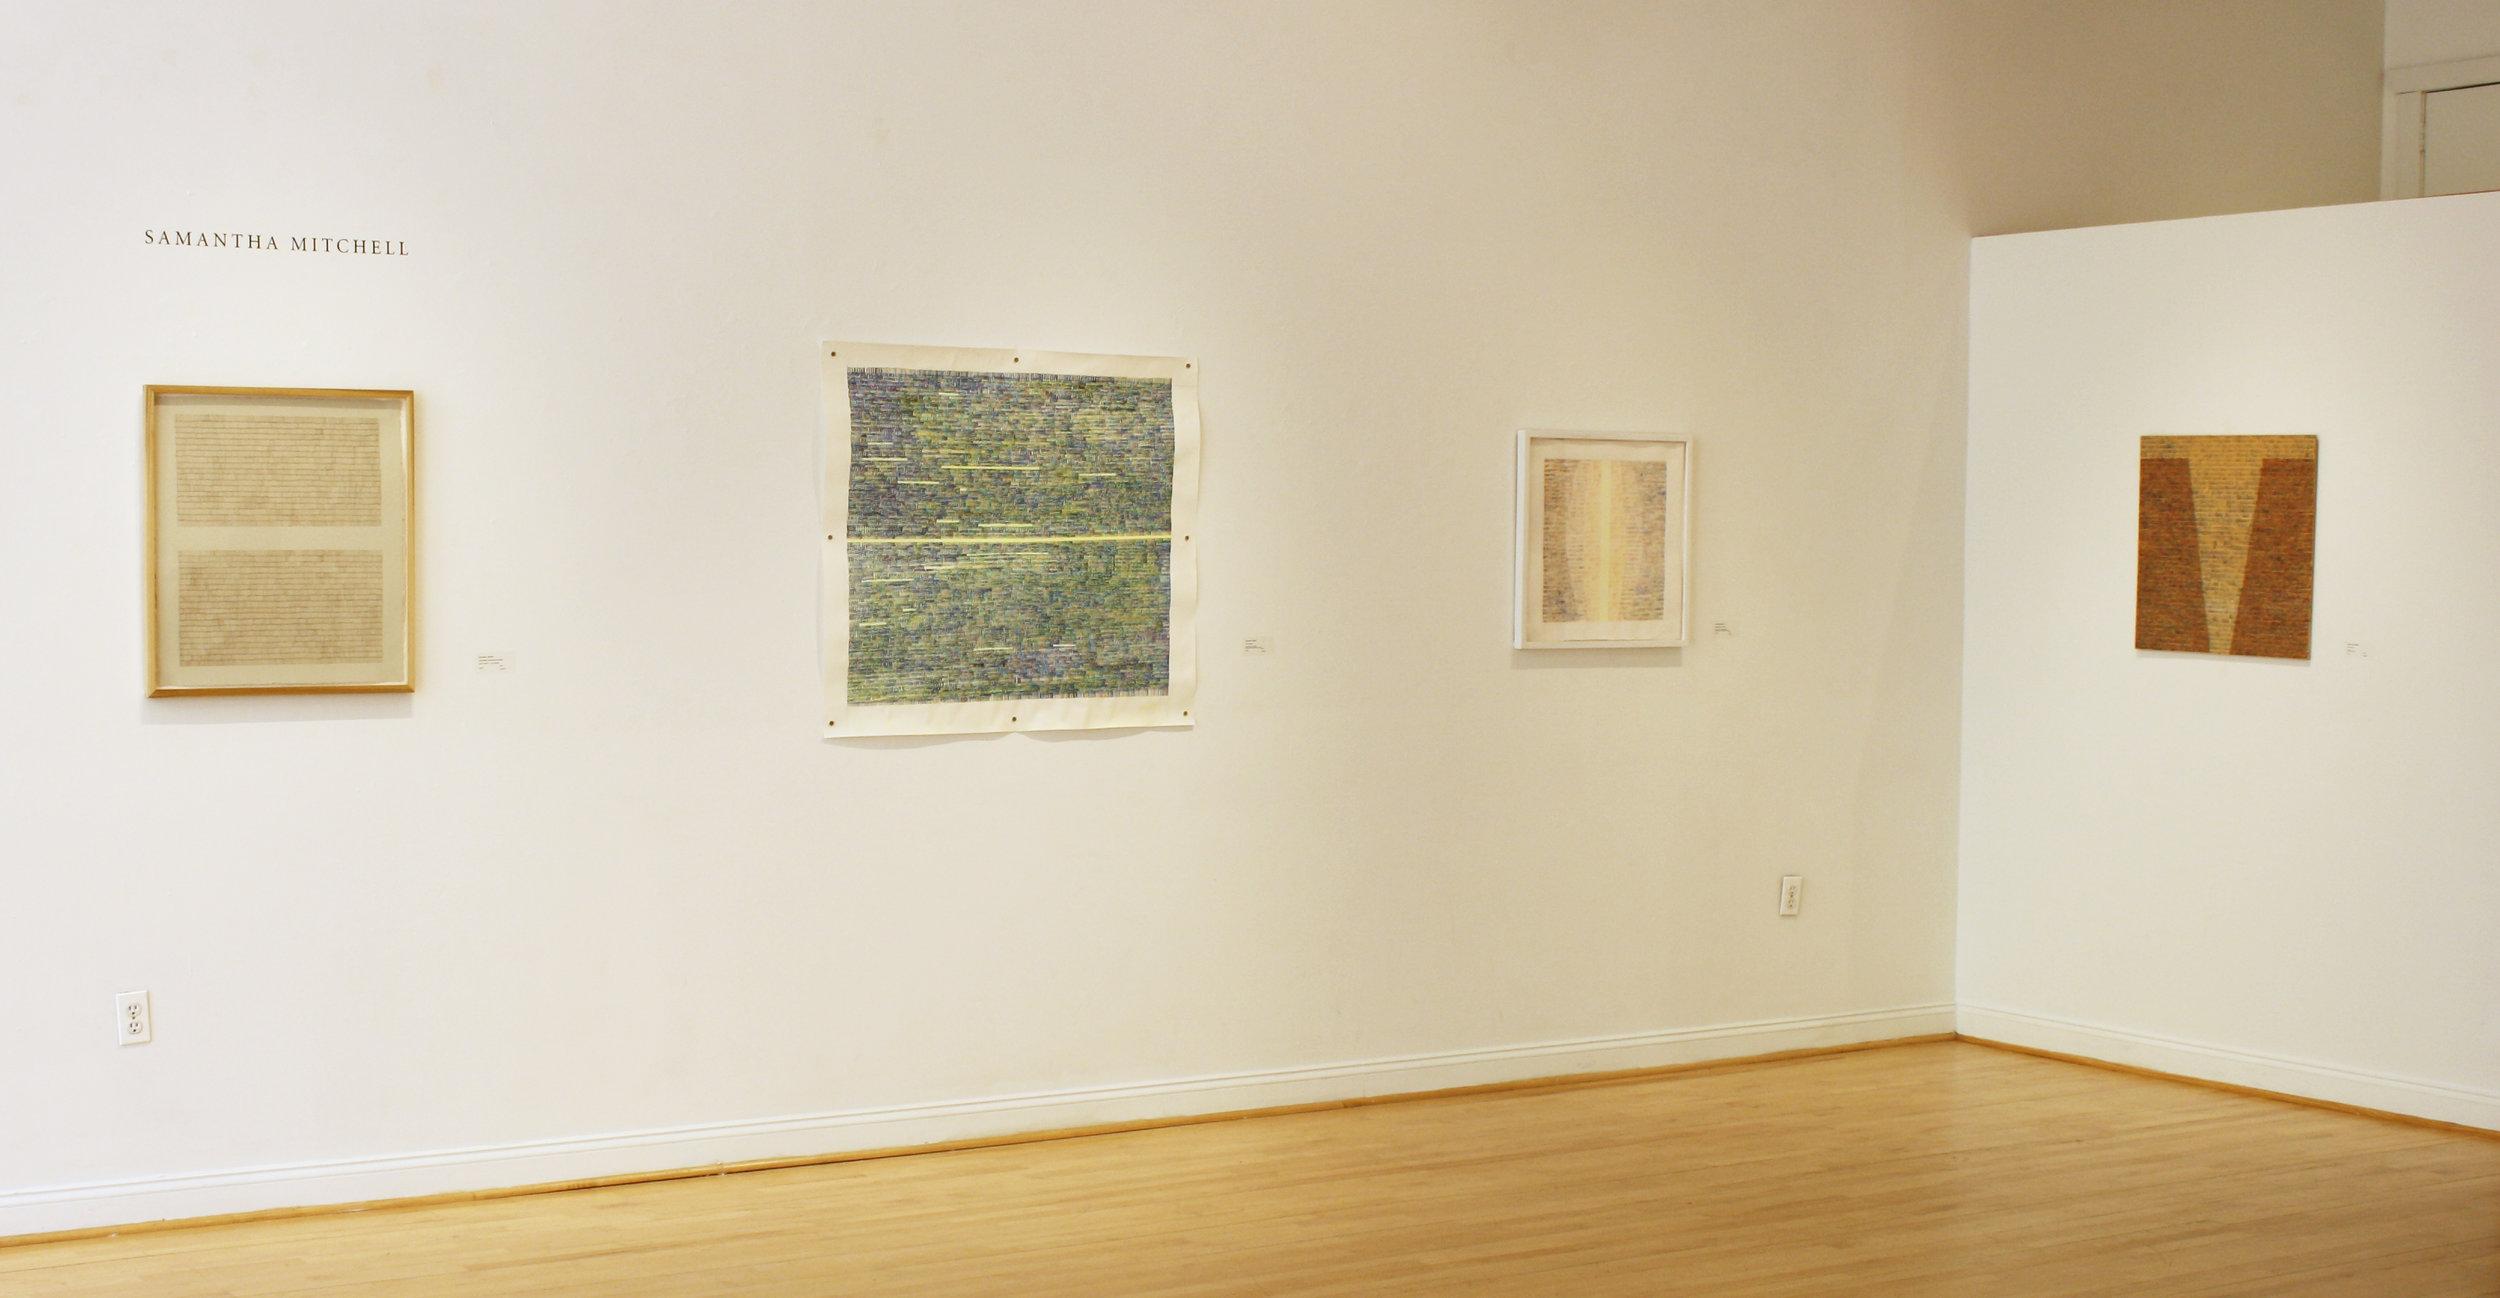 Meditations: SaraNoa Mark, Samantha Mitchell, Rowland Ricketts   Snyderman-Works Gallery  April 2017